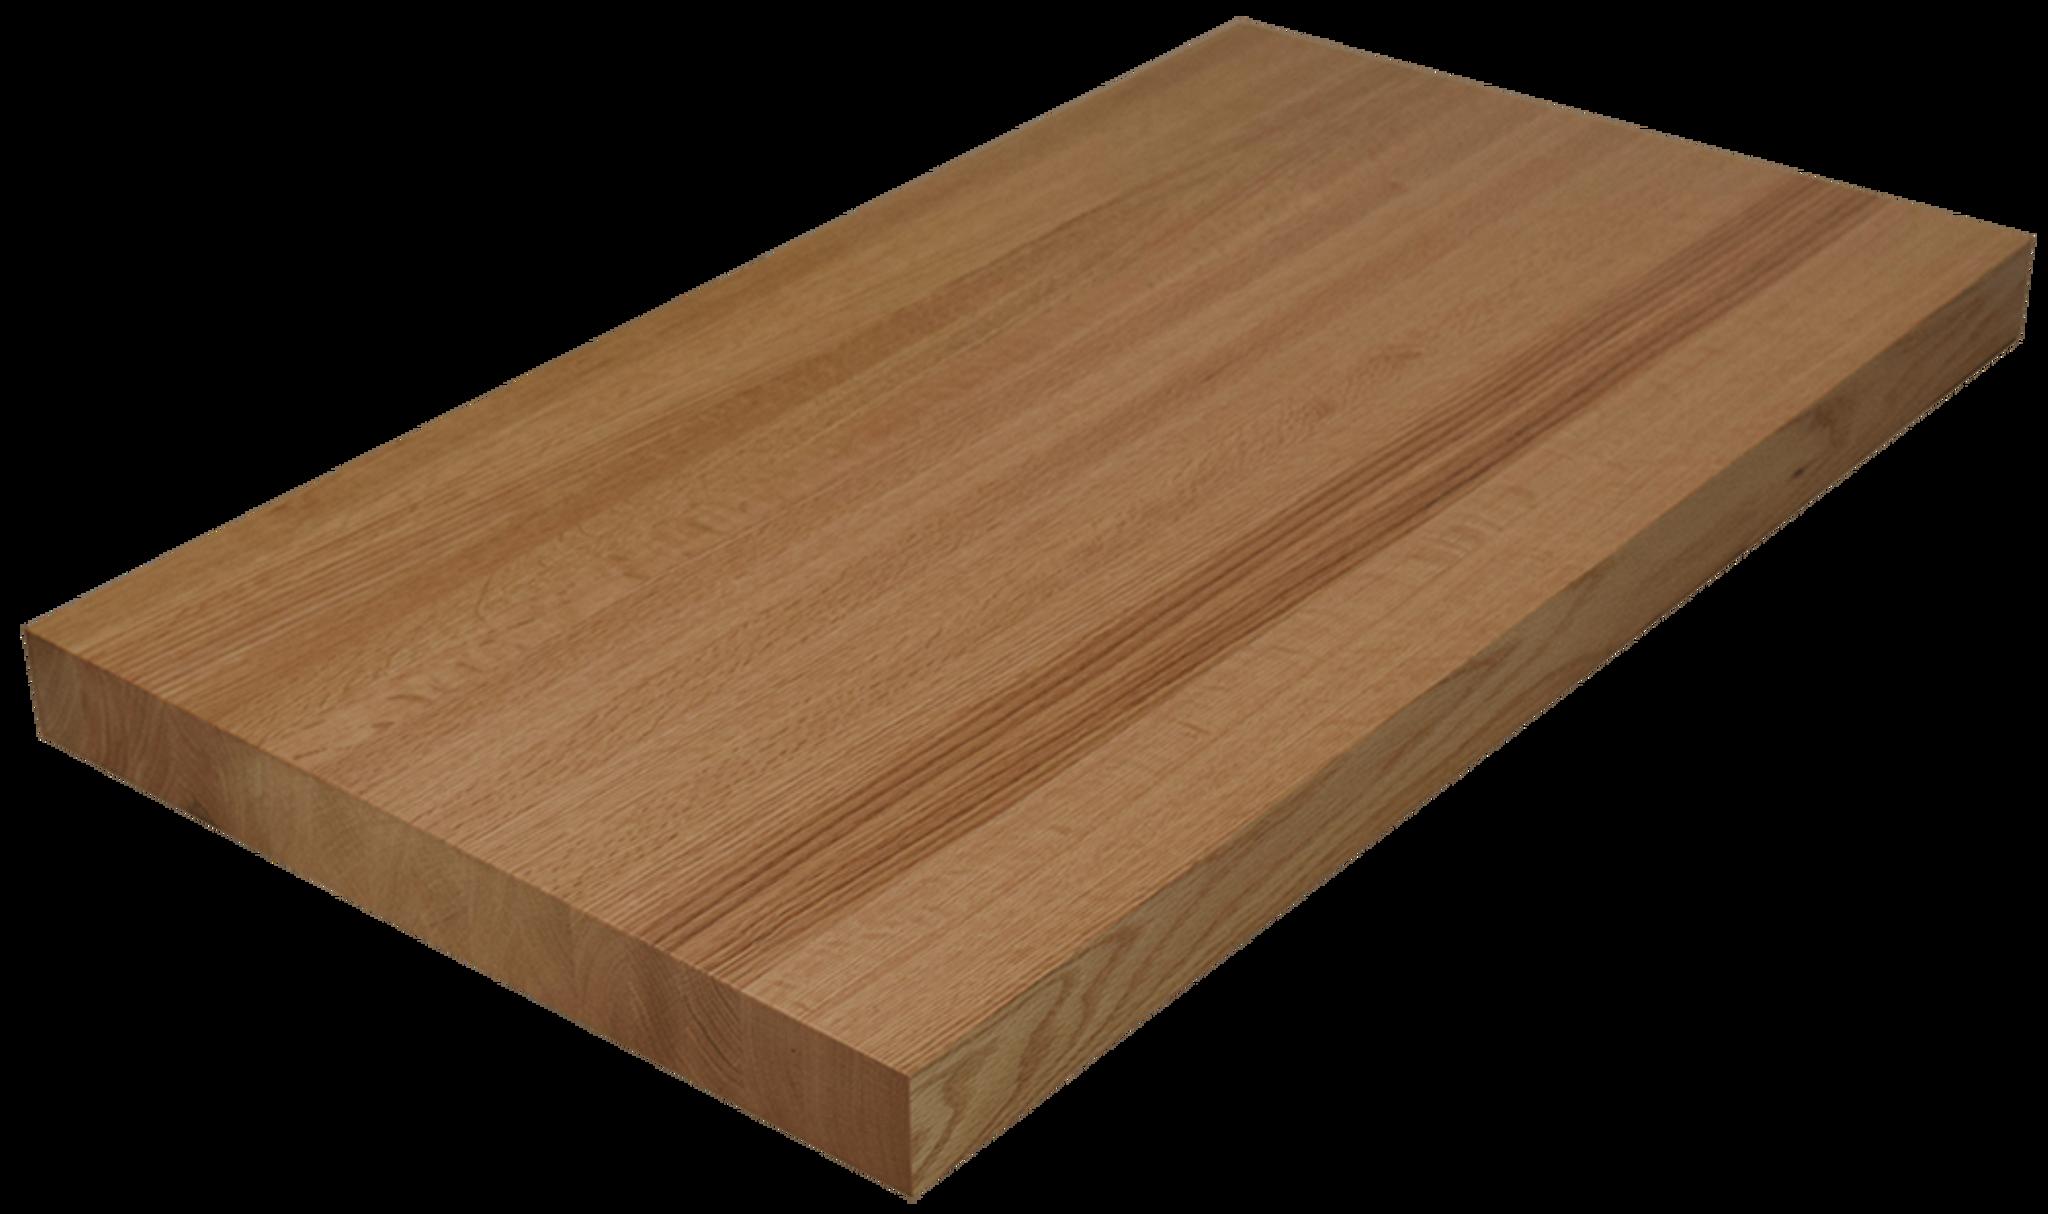 red oak edge grain butcher block countertop hardwood lumber company. Black Bedroom Furniture Sets. Home Design Ideas